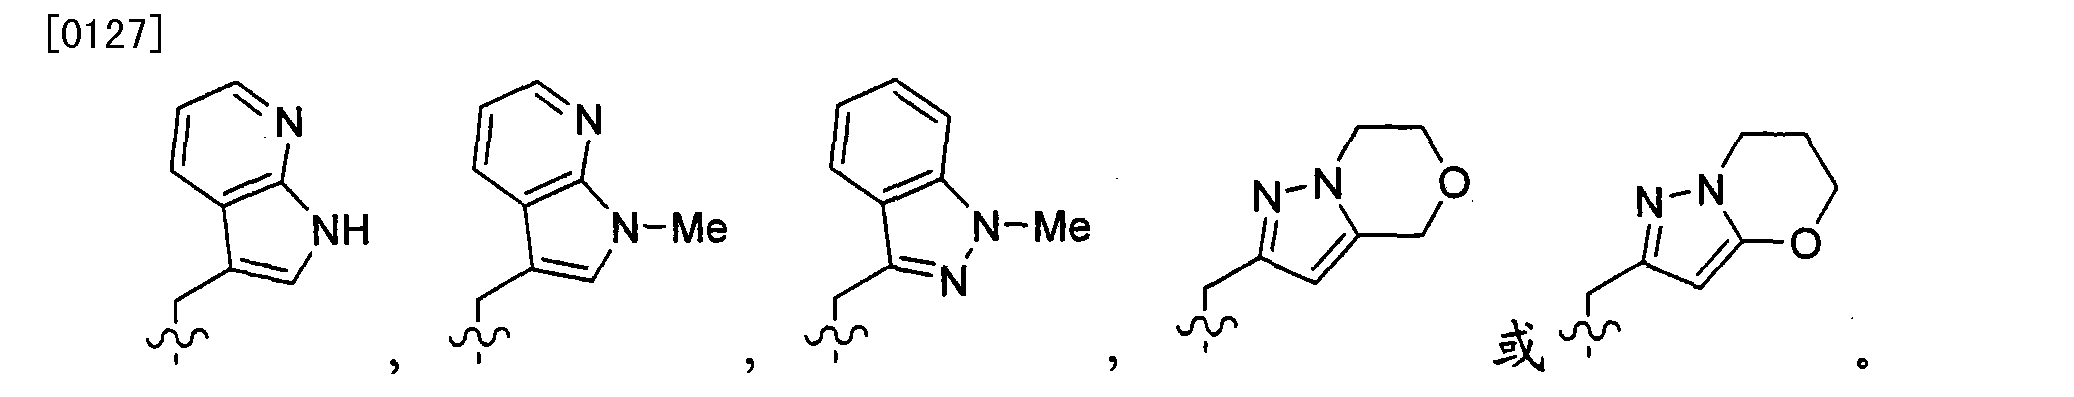 Cn101784516b Dipeptide Analogs As Coagulation Factor Inhibitors Case Ih 2366 Combine Wire Diagram Figure Cn101784516bd00302